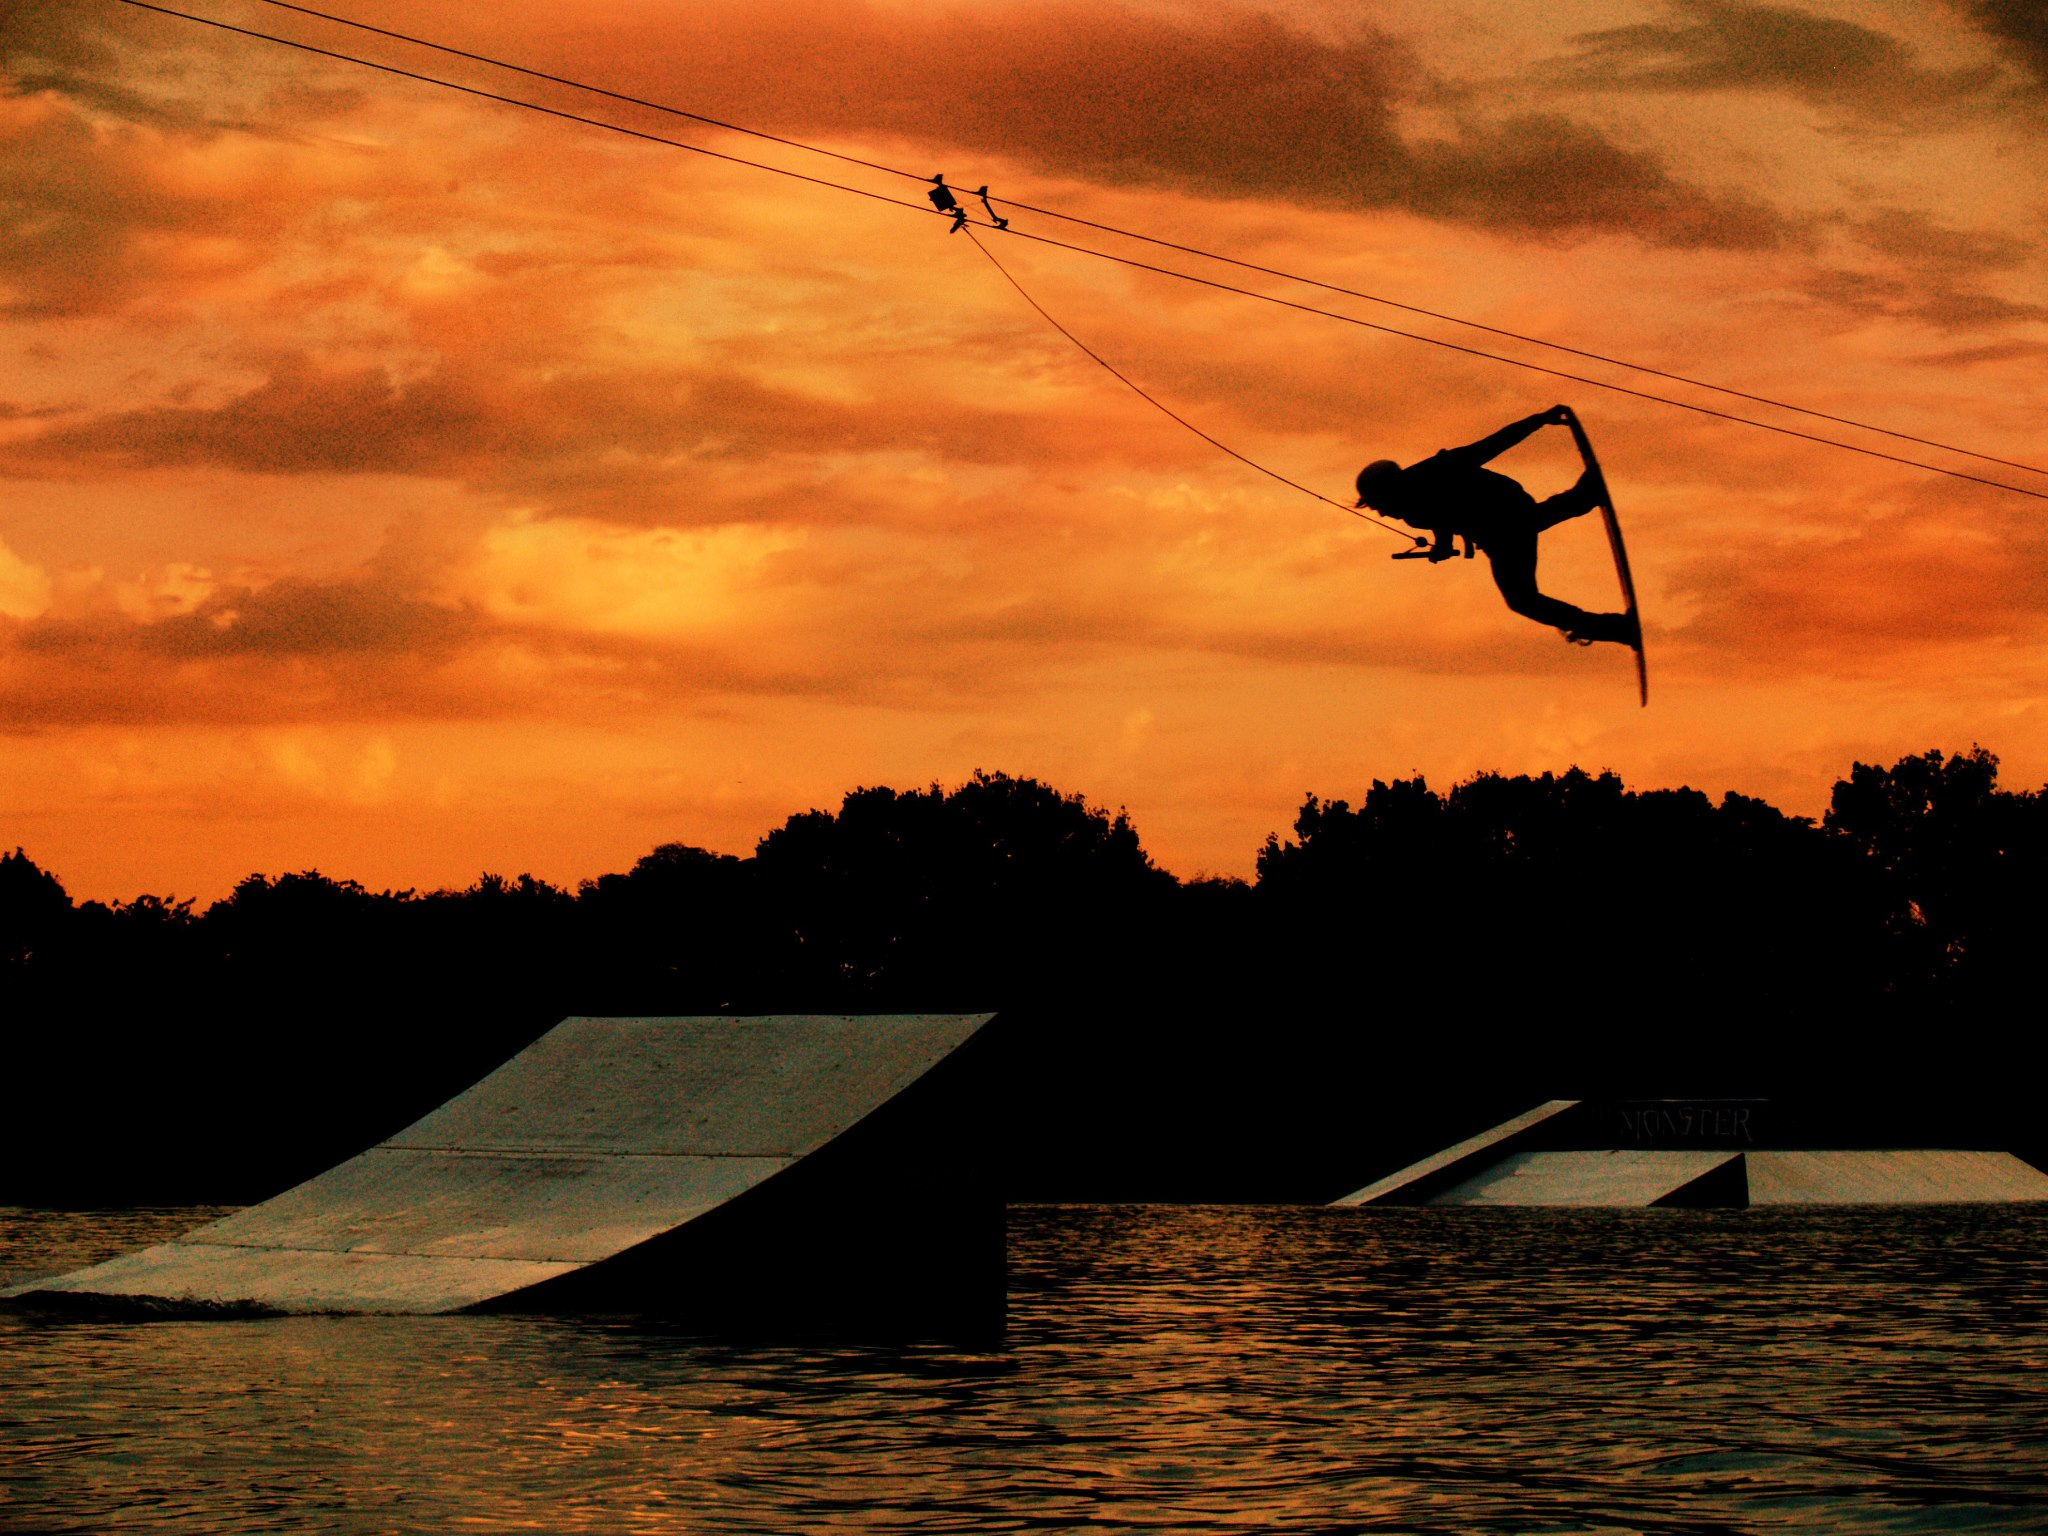 Wakeboarding Boat Wallpaper ChristyBlum - A...